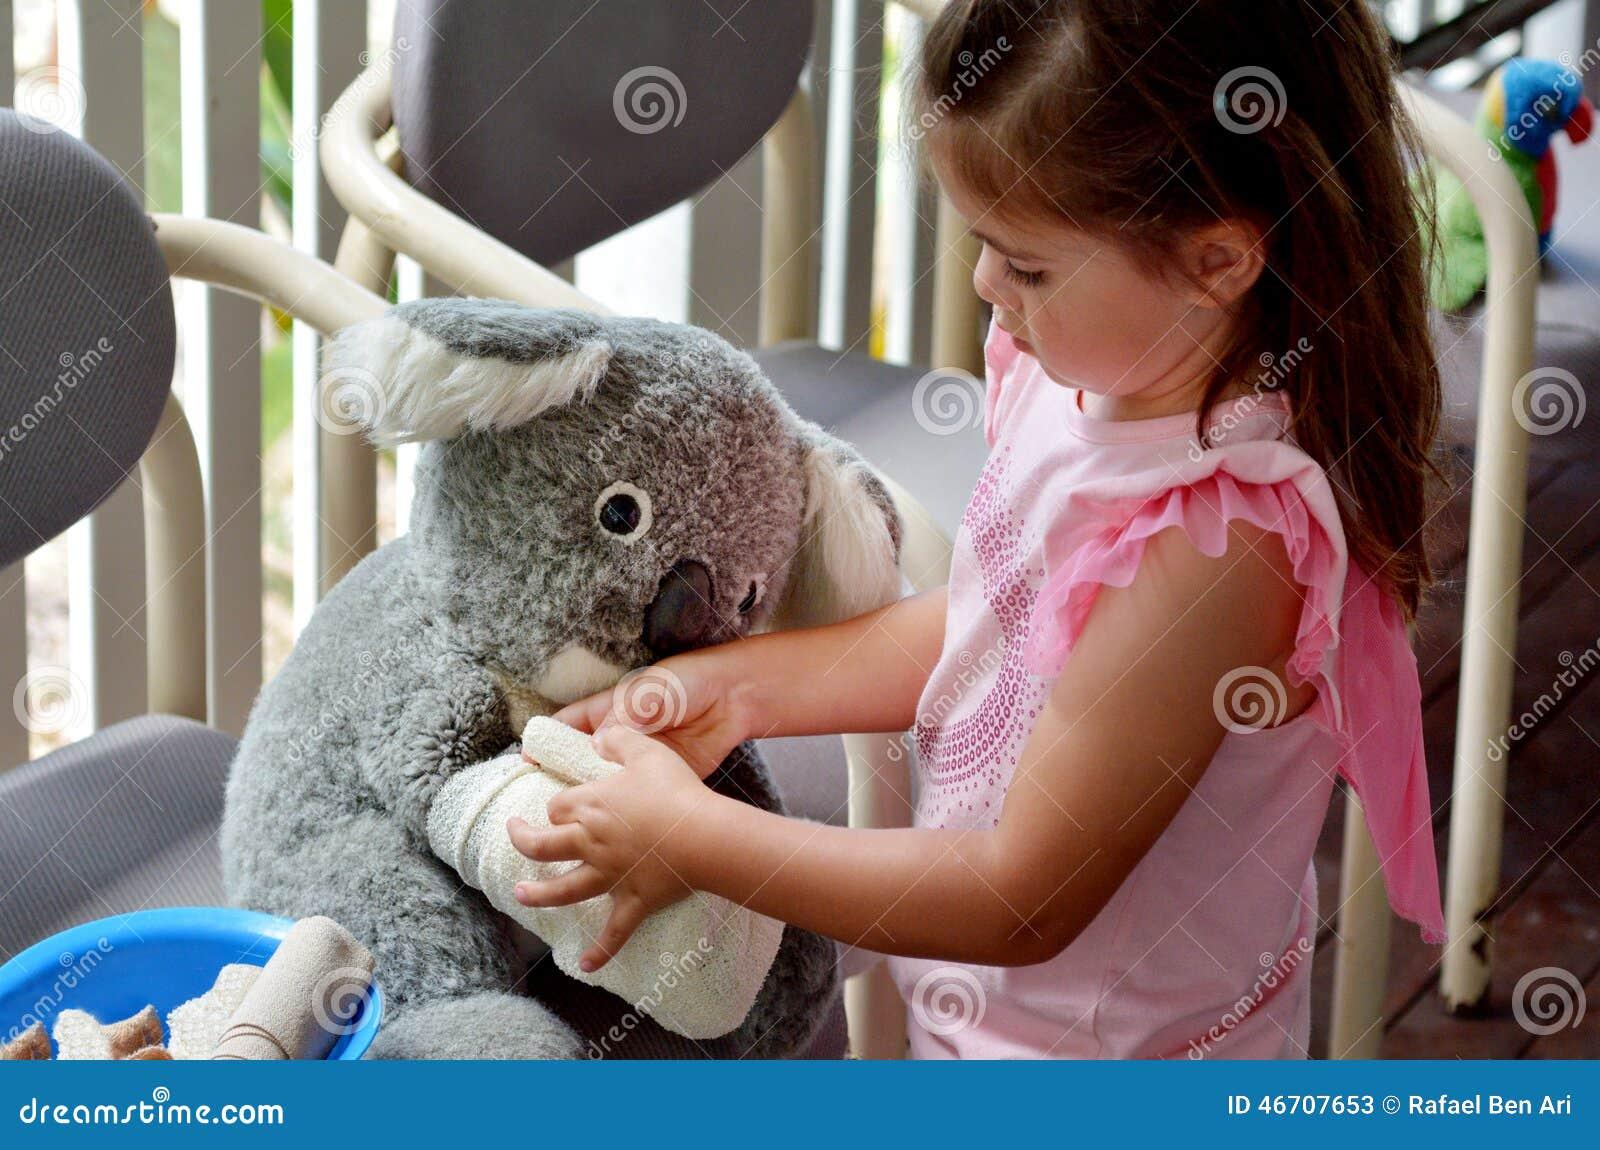 veterinar kid Little girl play pretend to be animal doctor - Veterinary physic